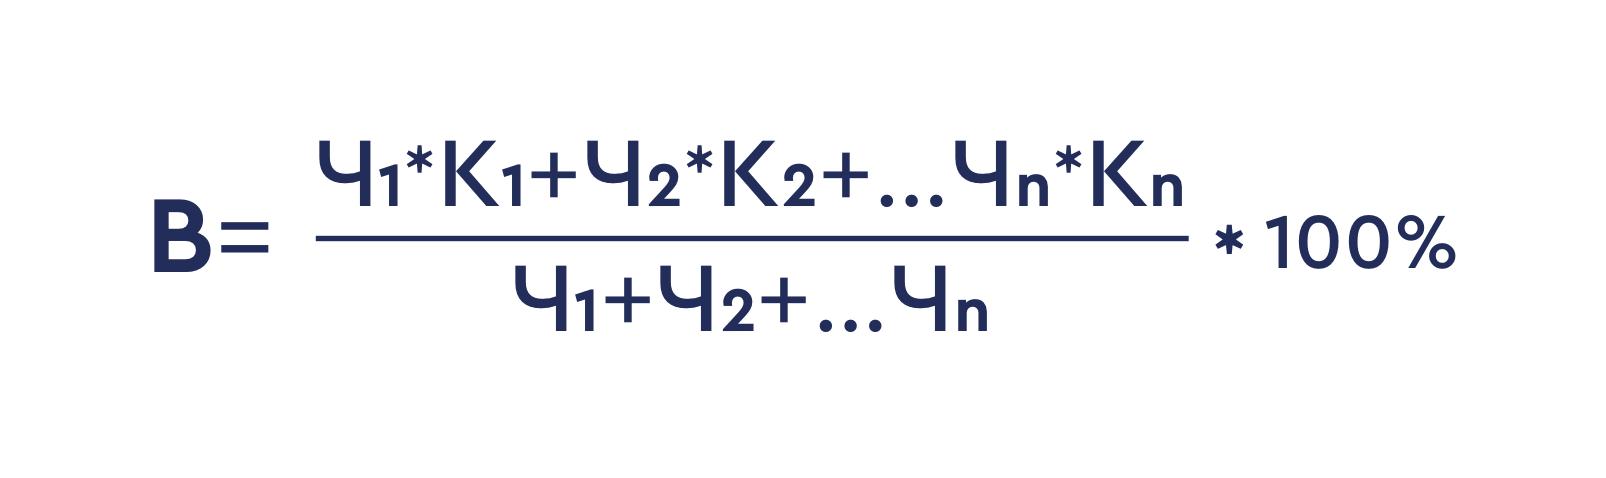 Формула видимости сайта